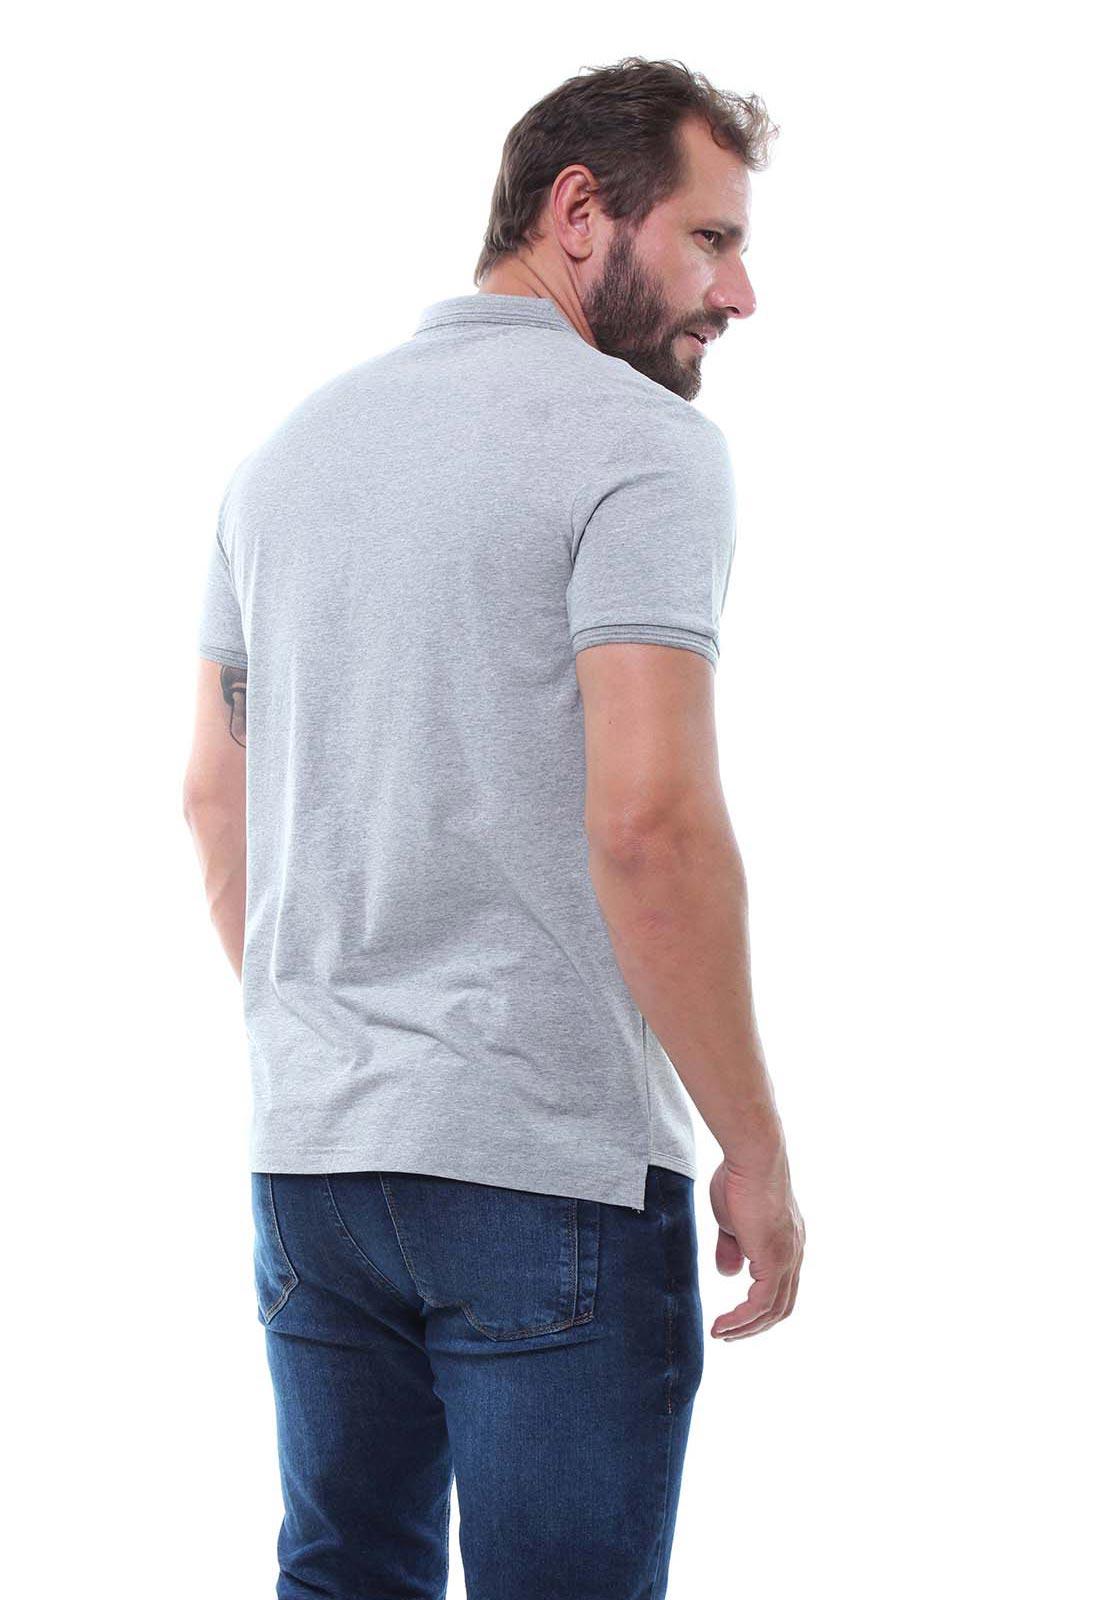 Camisa Gola Polo Masculina Manga Curta Crocker -47852  - CROCKER JEANS